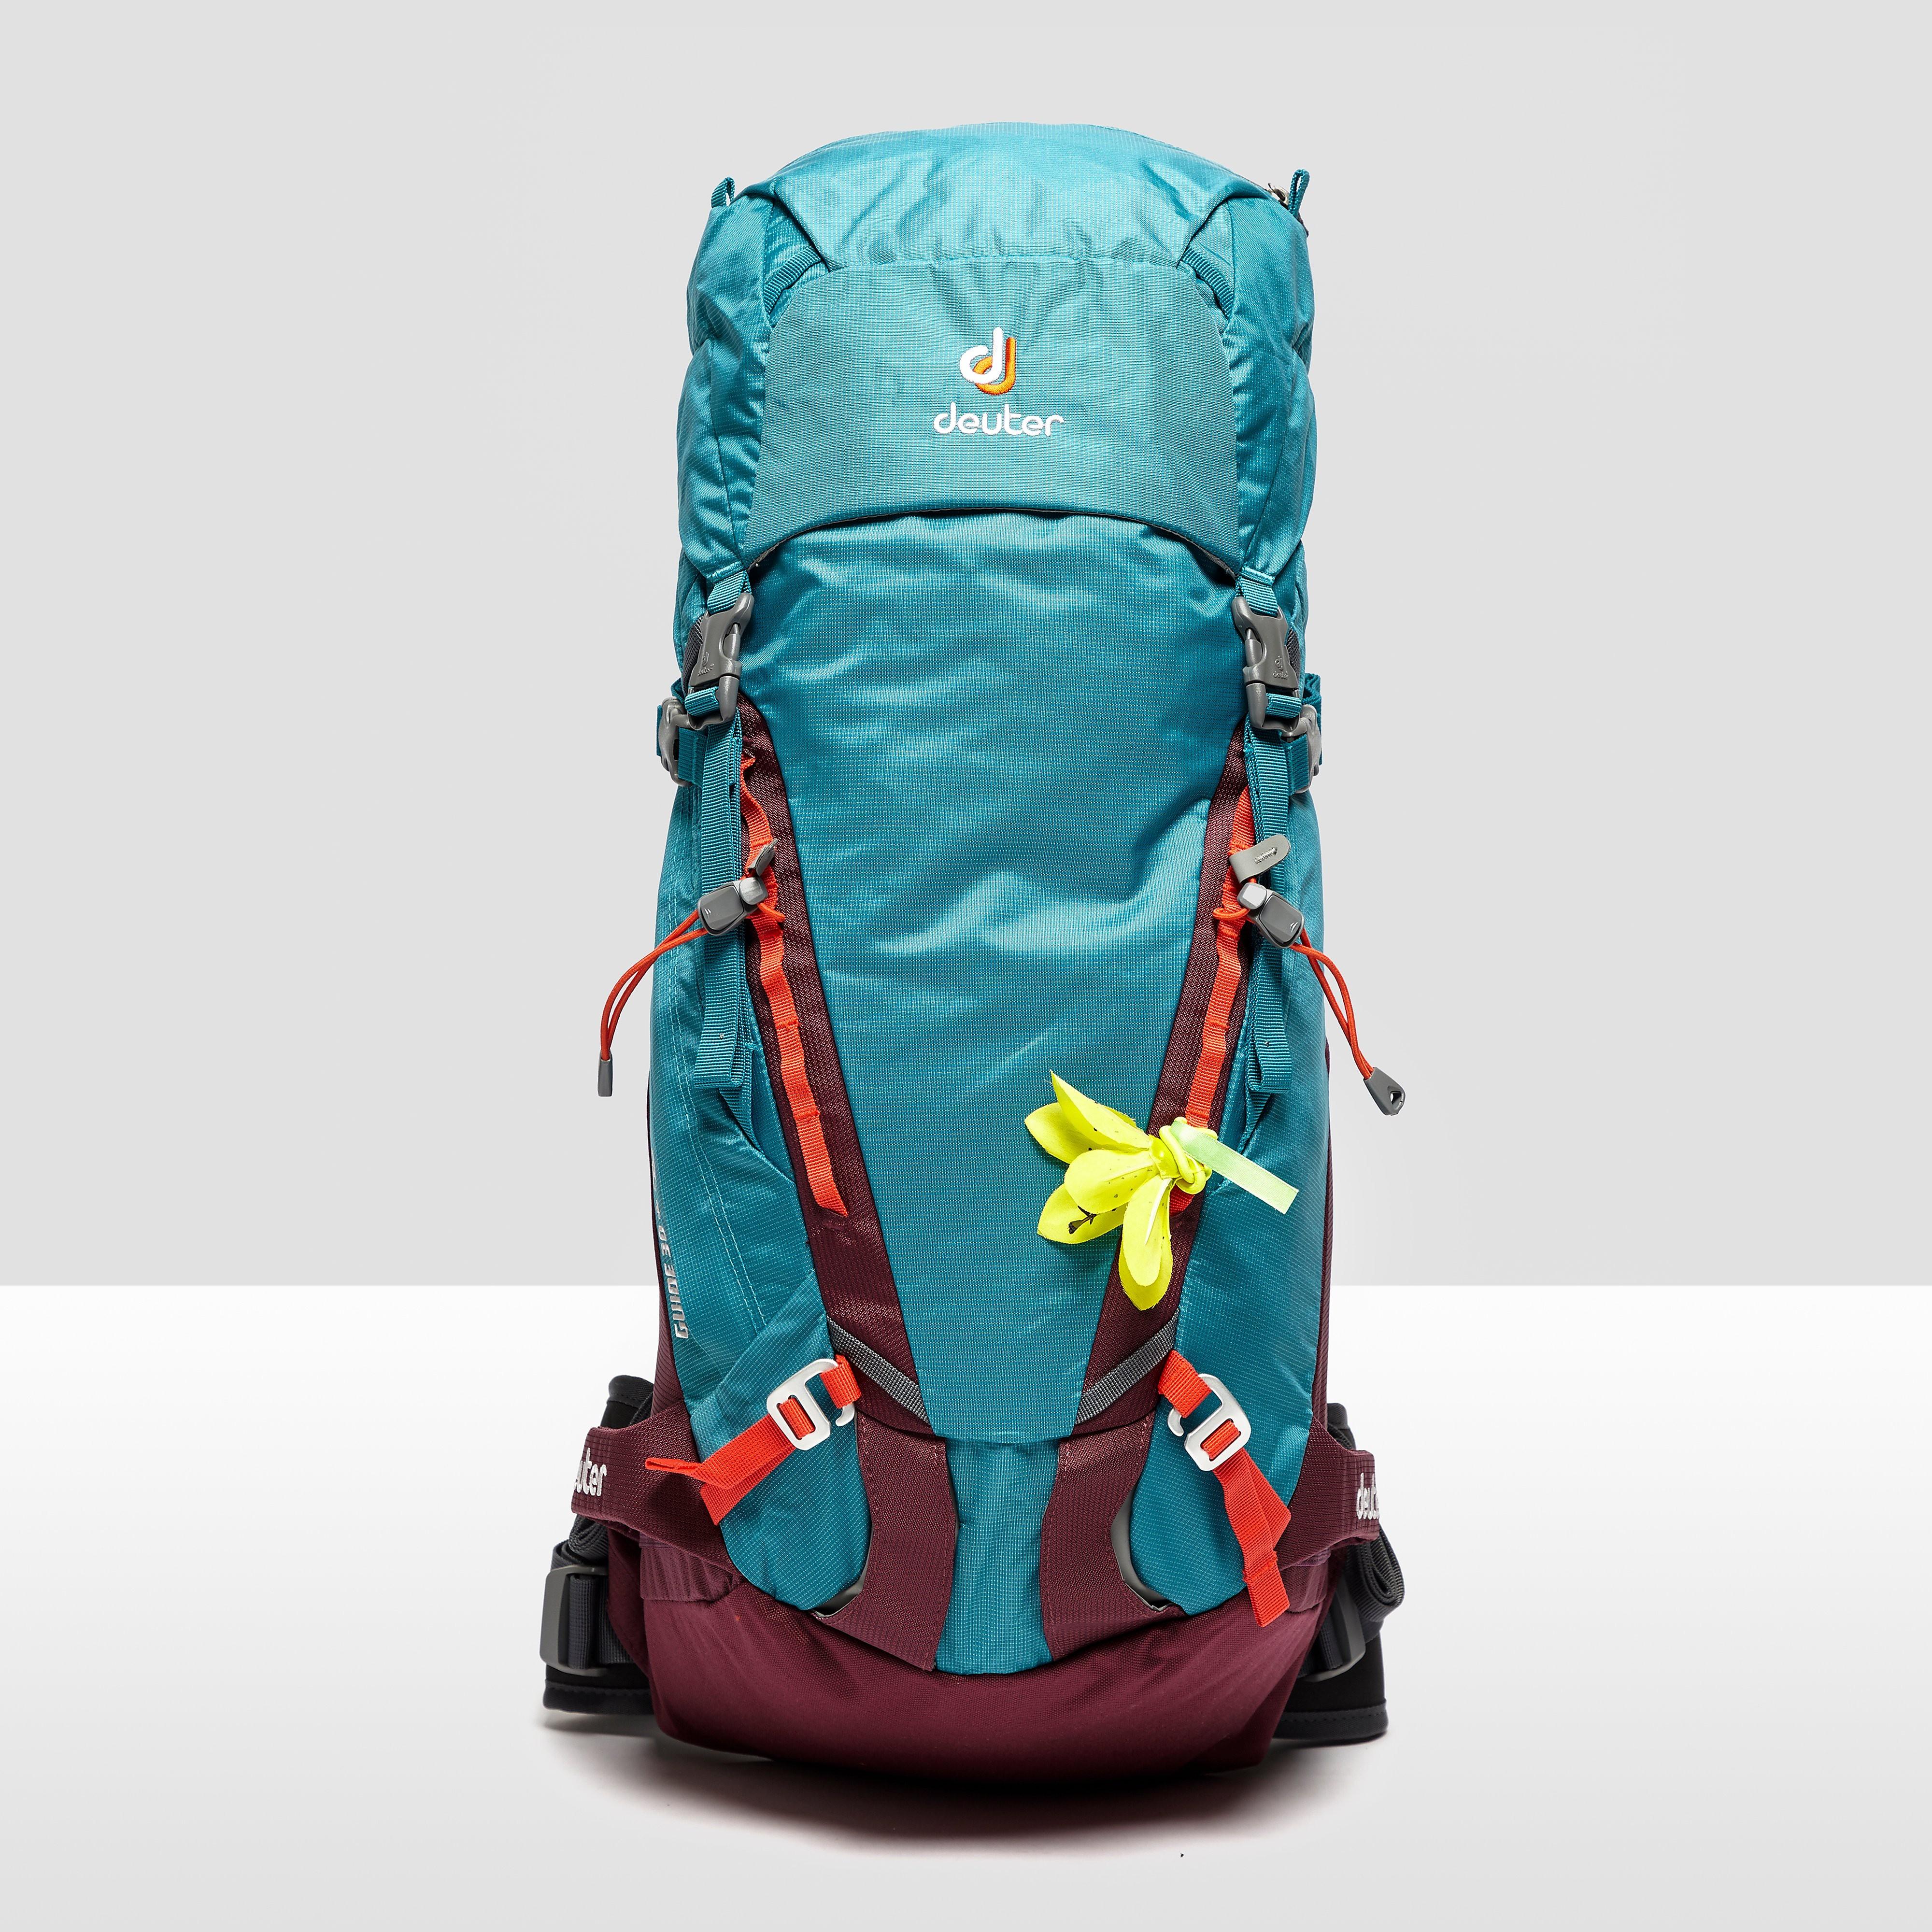 Deuter Guide 30L + 6 SL Womens Backpack